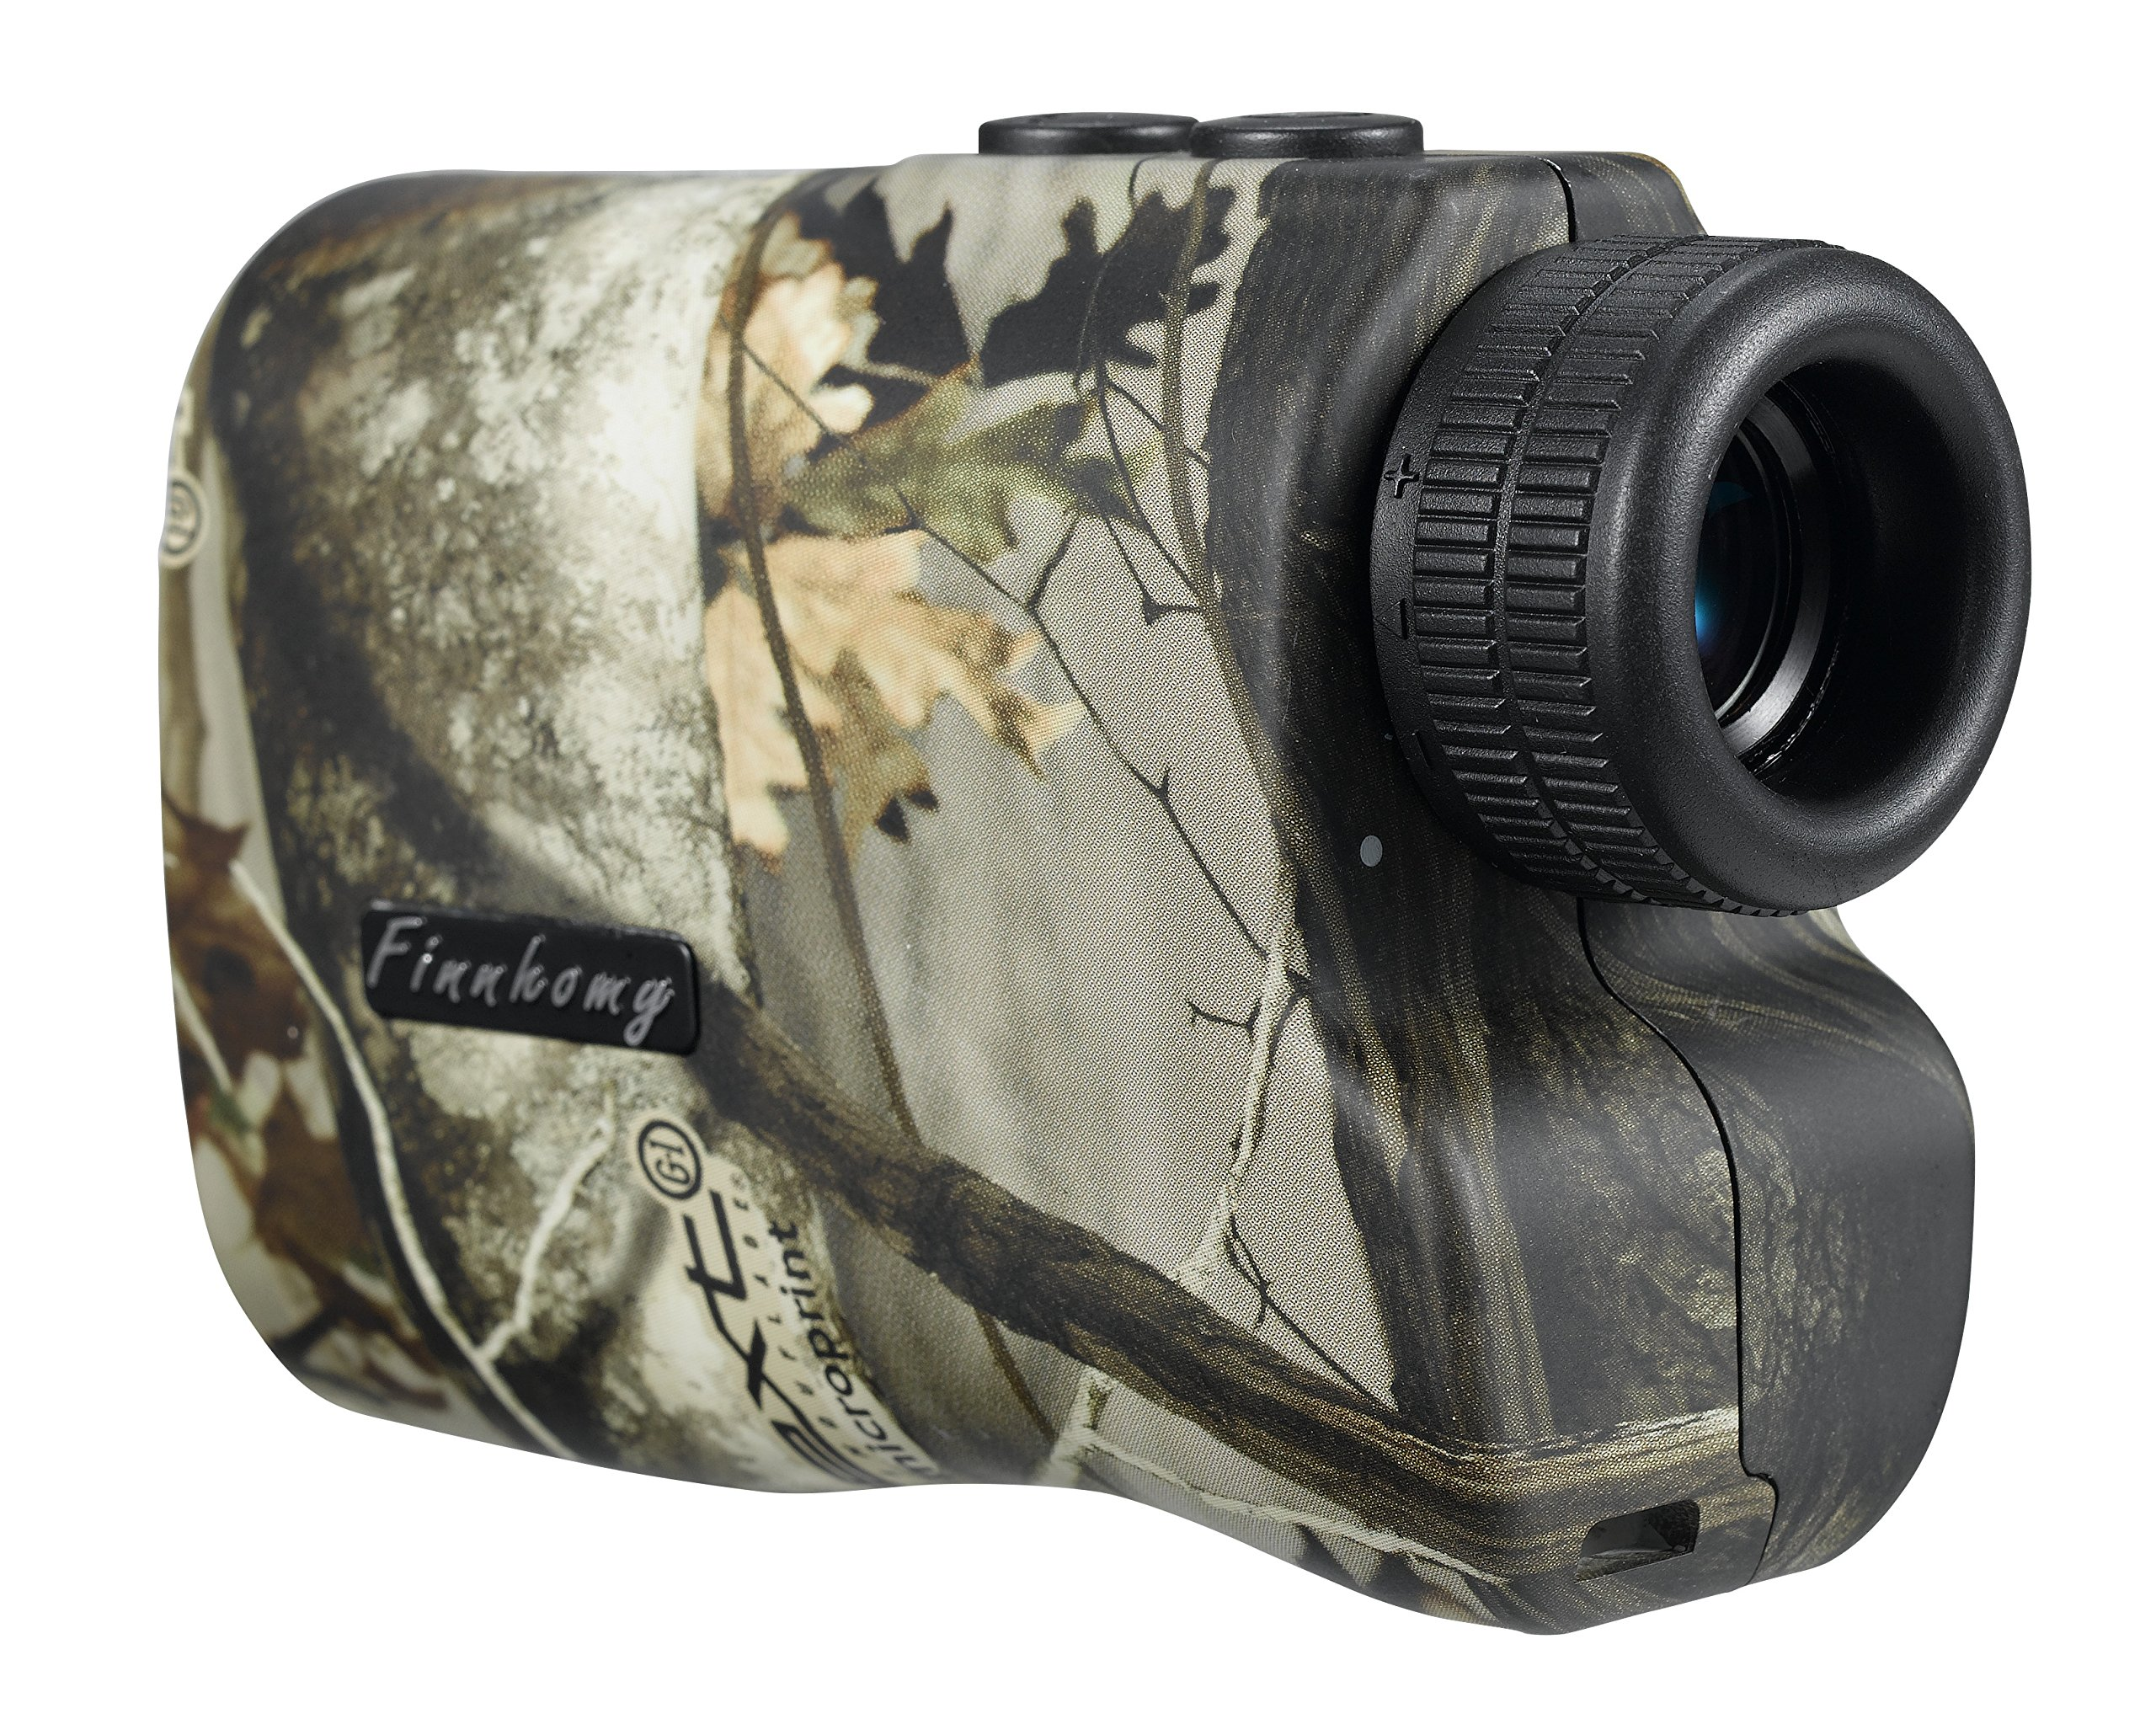 Finnhomy 6 x 25mm Laser Binocular Rangefinder Distance Range Finder Speed Distance Measurement Scope 600 Yards Outdoor Activity Hunting Golf Racing Climbing Navigation Forestry Waterproof Free Battery by Finnhomy (Image #2)